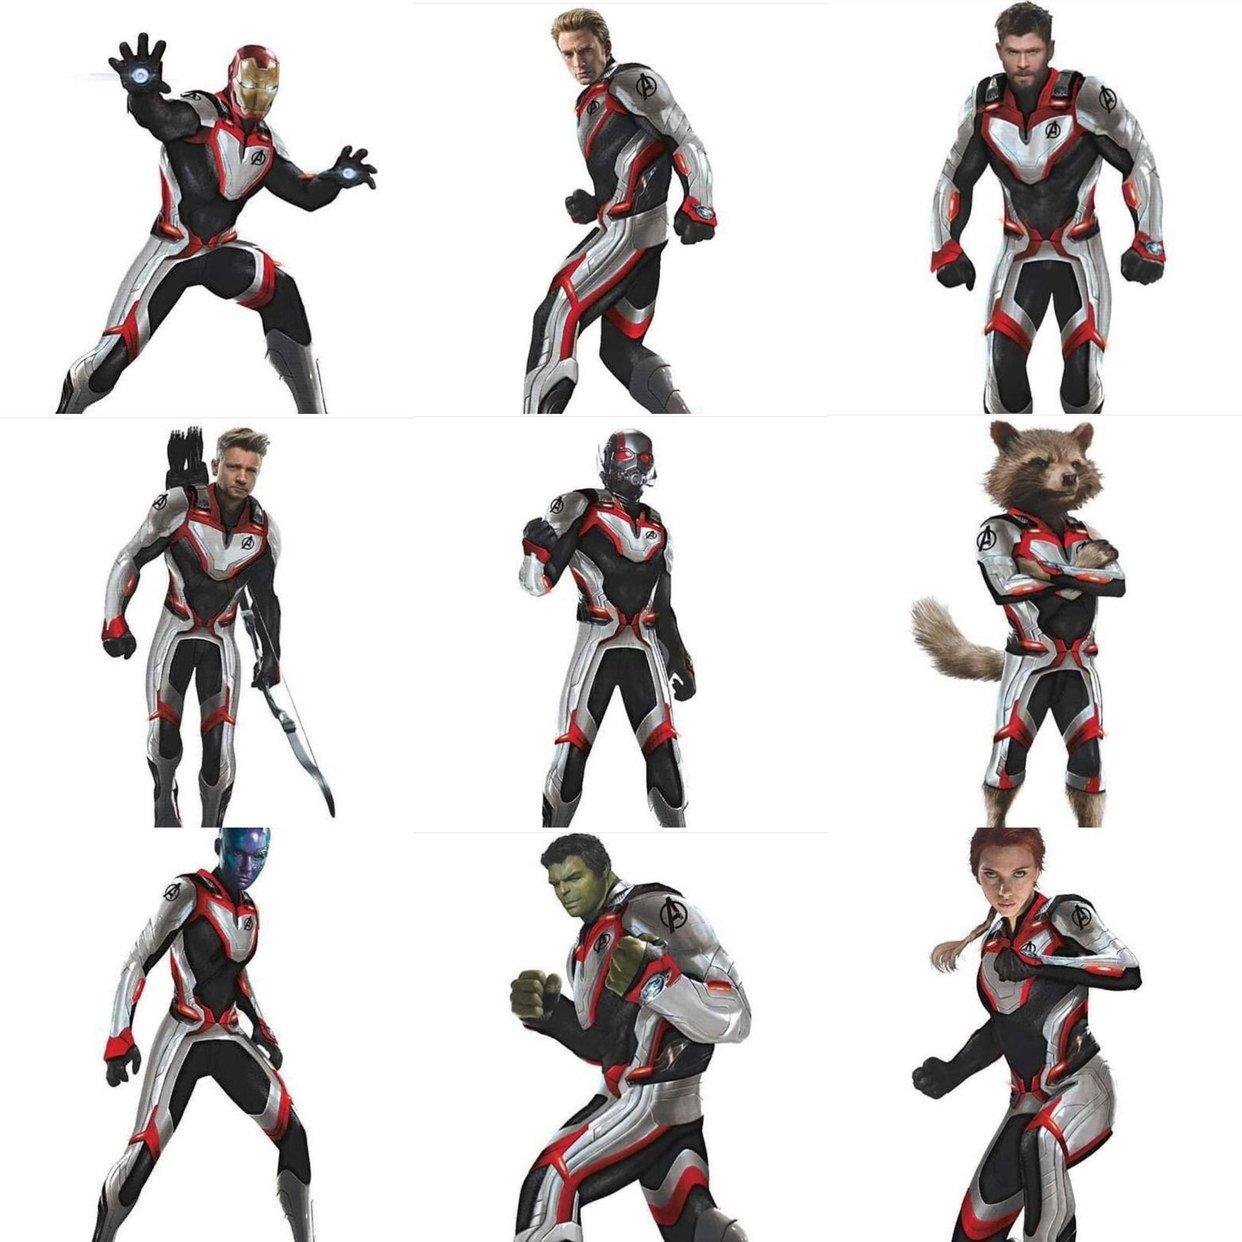 Quantum Realm Avengers Suits New White Suits